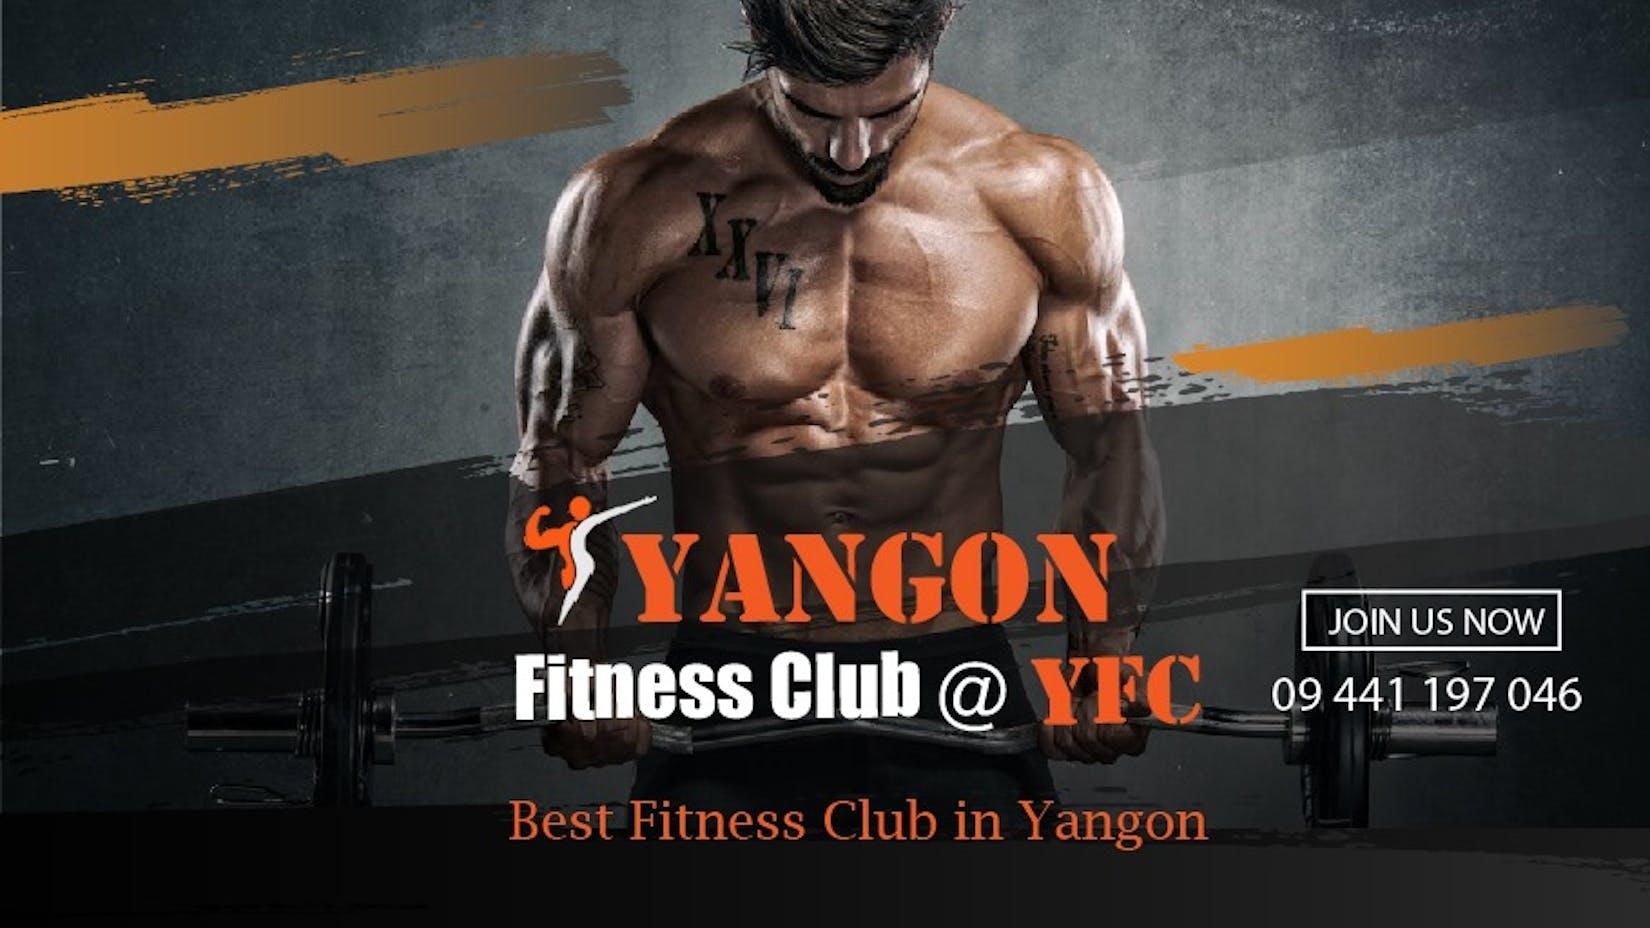 Yangon Fitness club -4 | Beauty